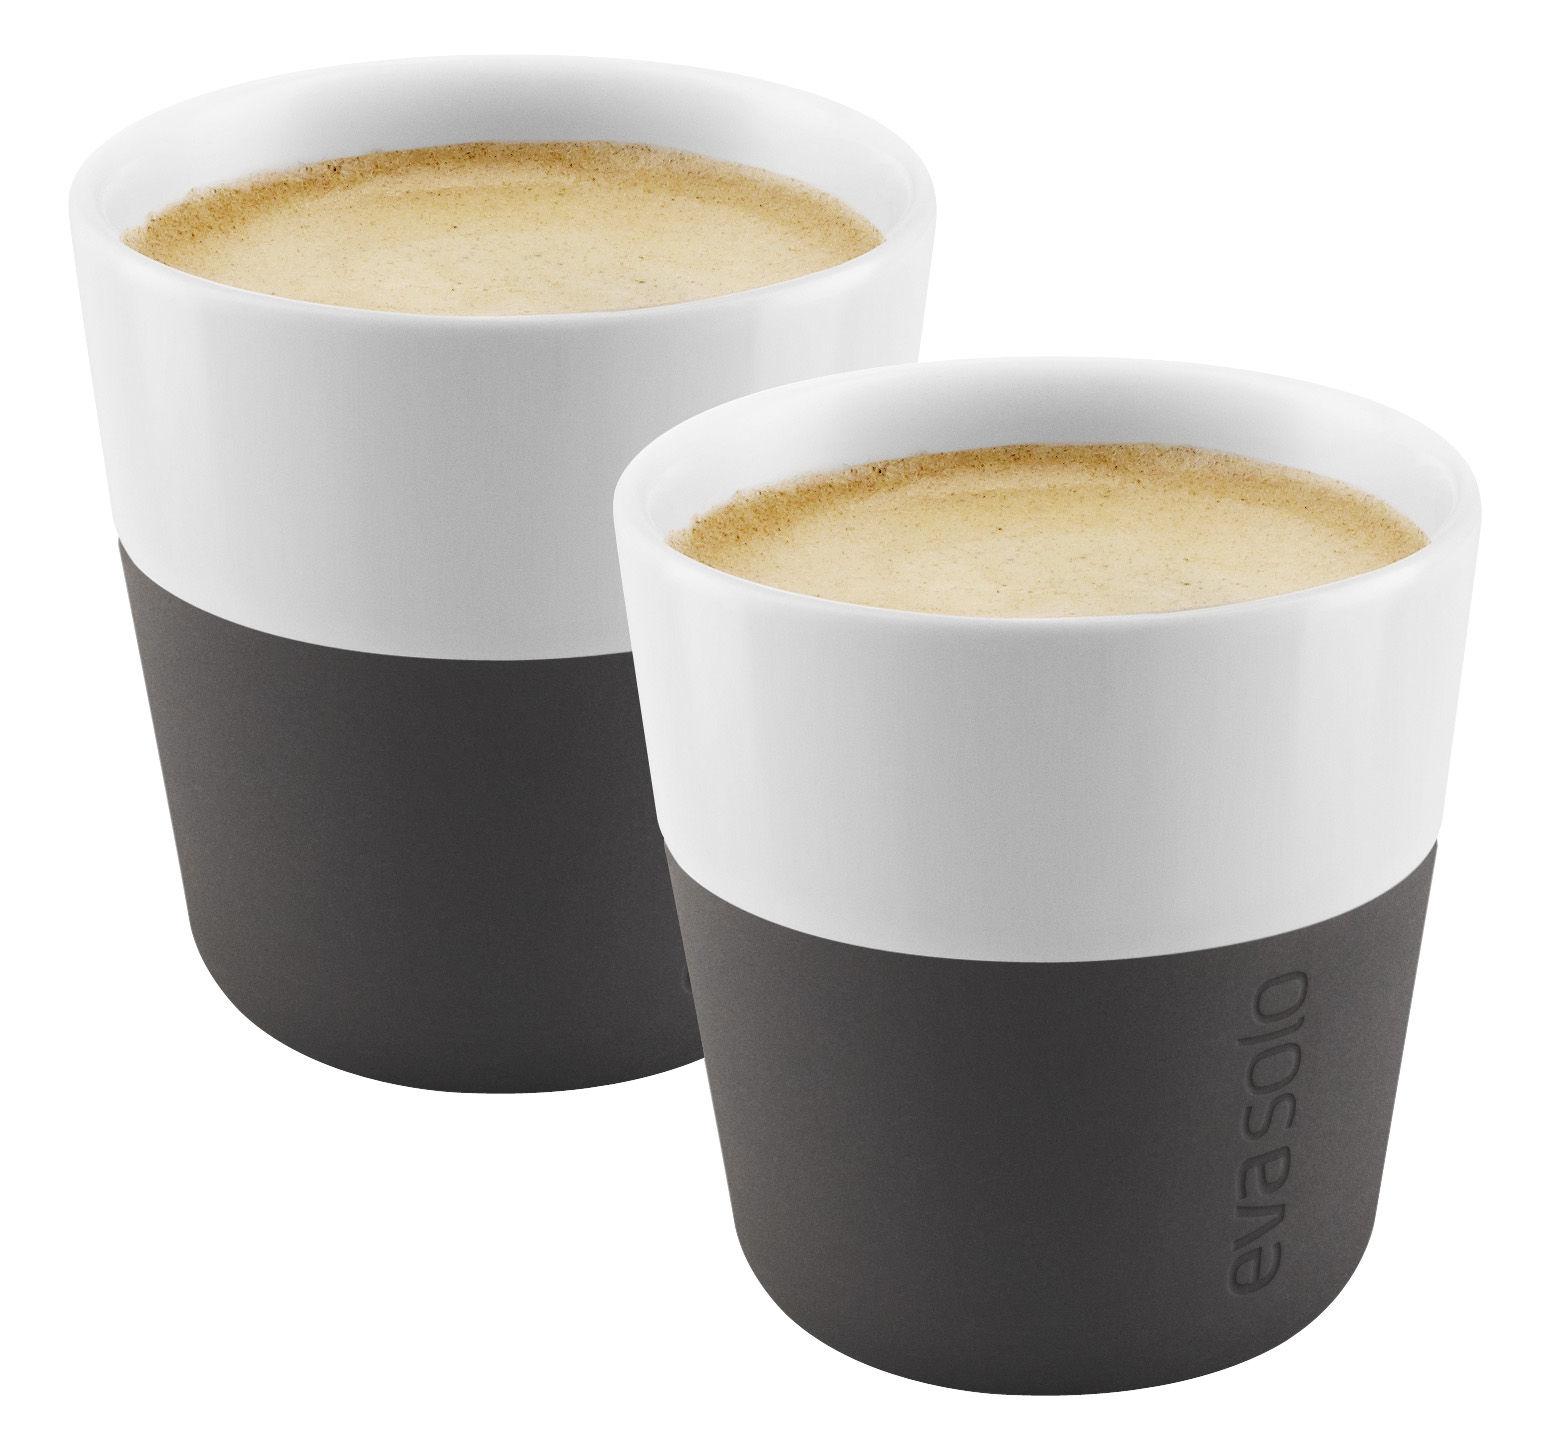 tasse espresso set de 2 80 ml noir carbone eva solo. Black Bedroom Furniture Sets. Home Design Ideas